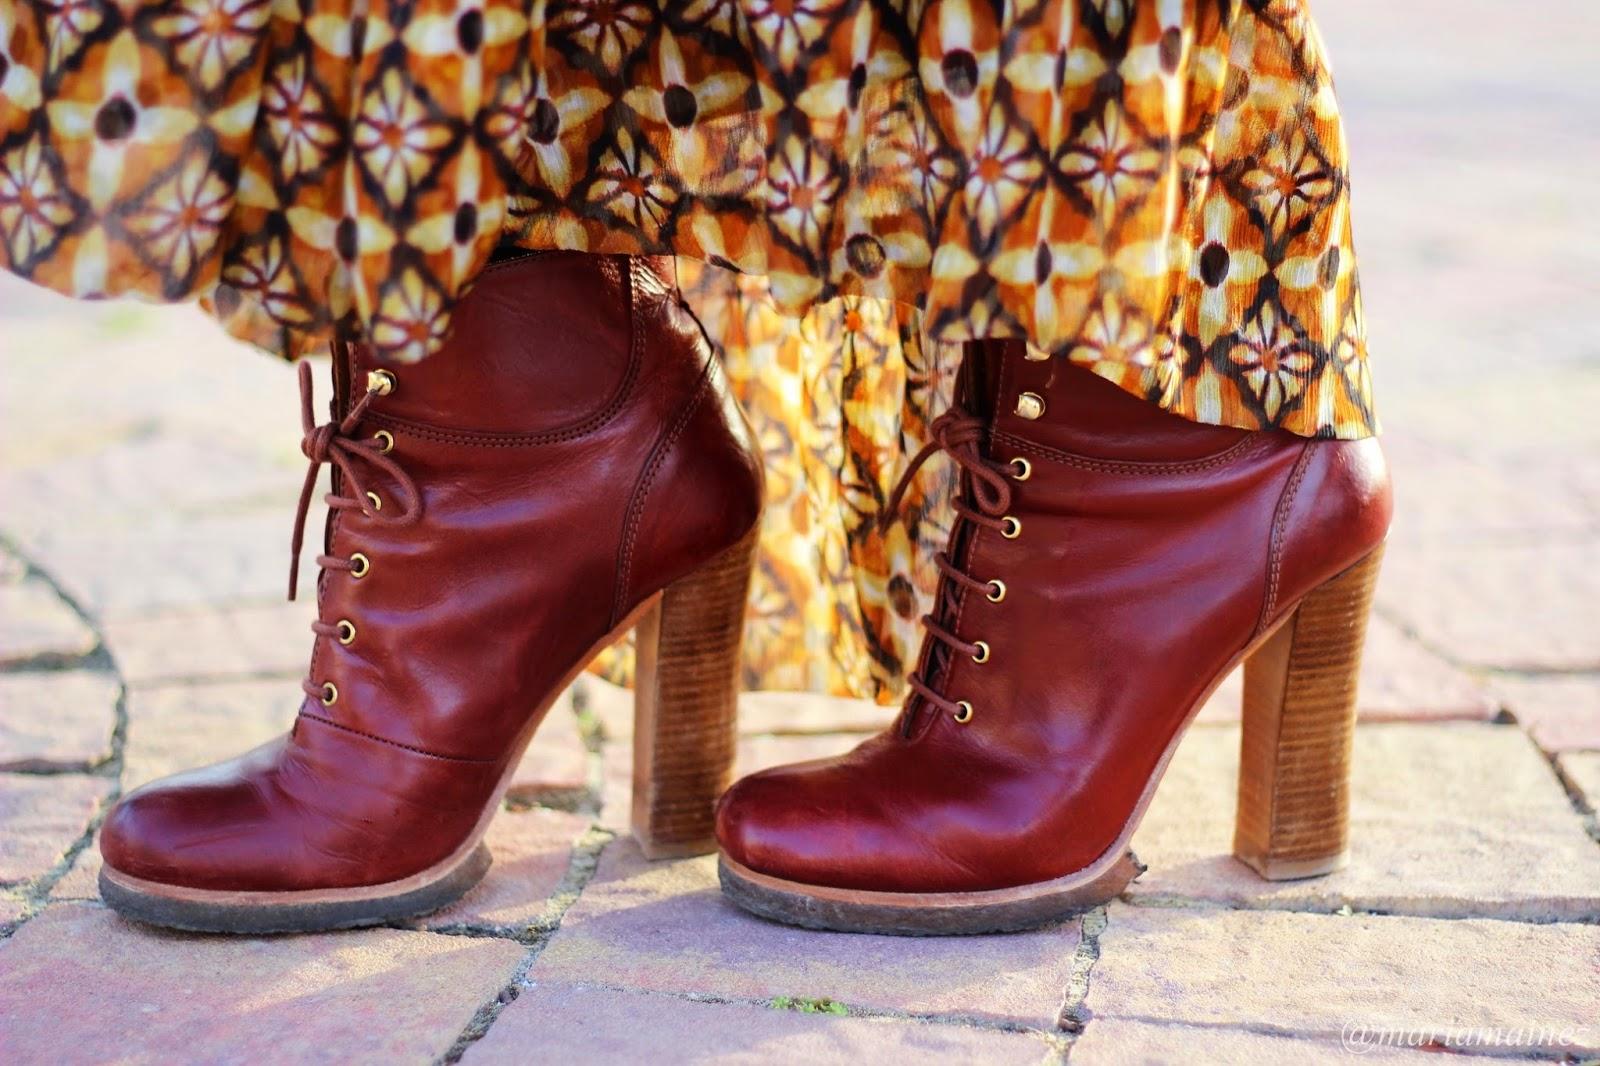 Calzado piel - Baltarini shoes